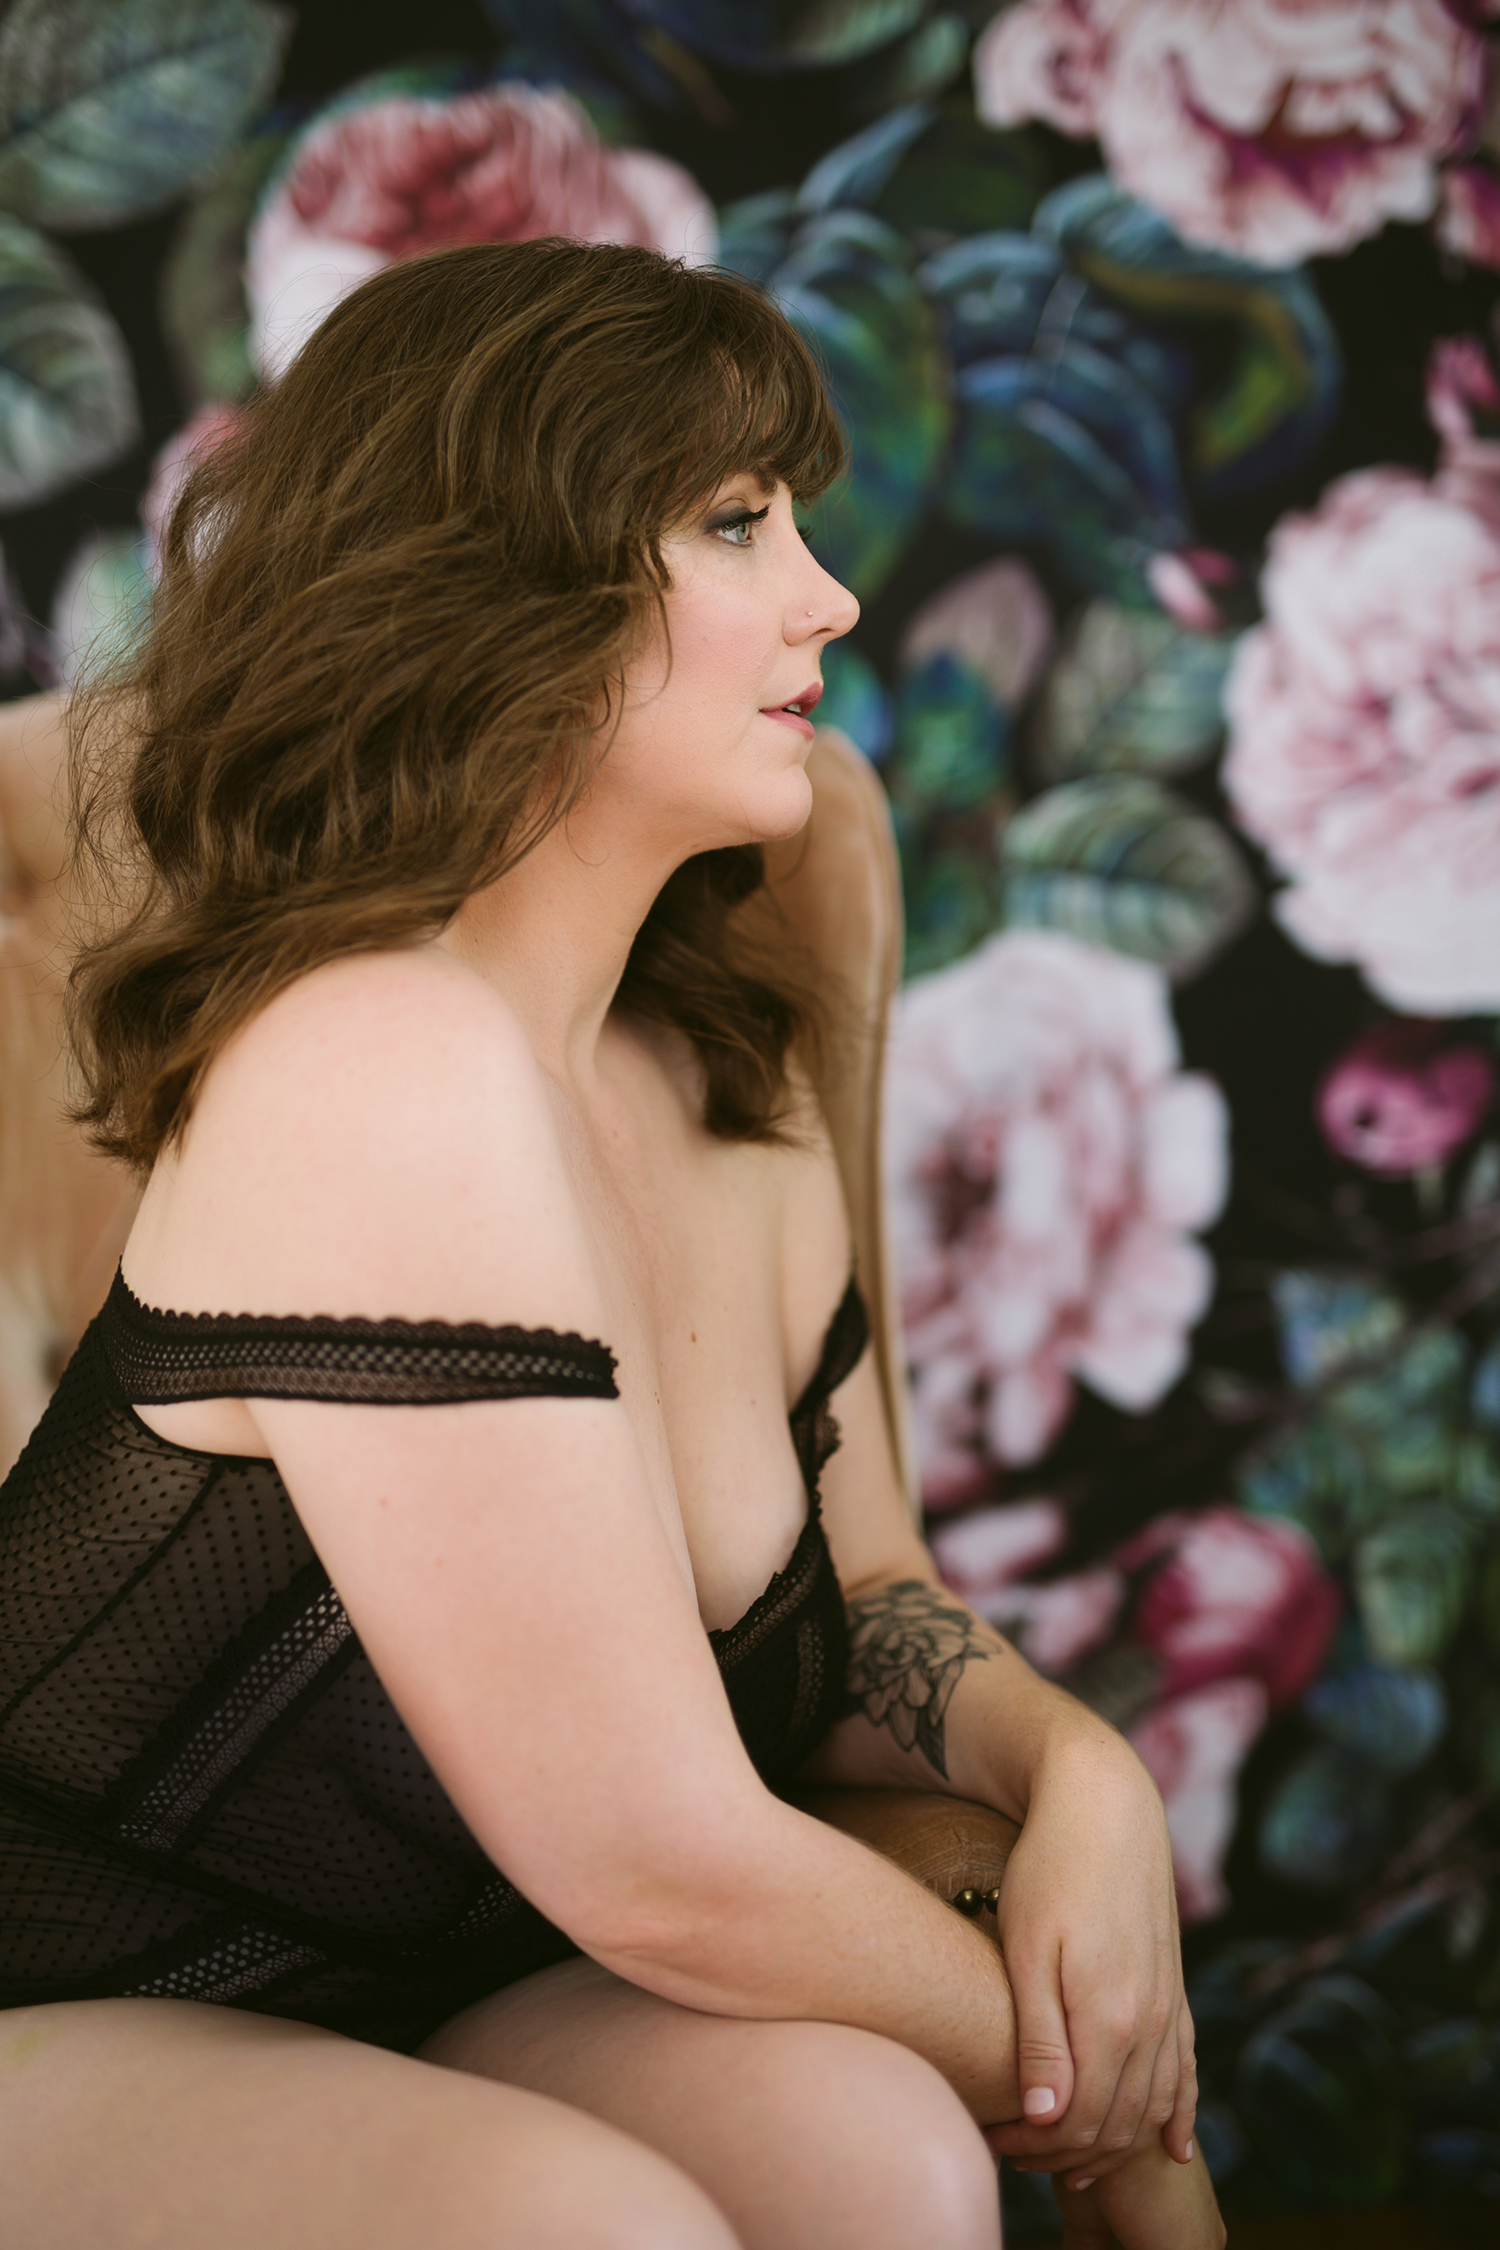 austin-texas-classy-boudoir-photography-KBB28.jpg